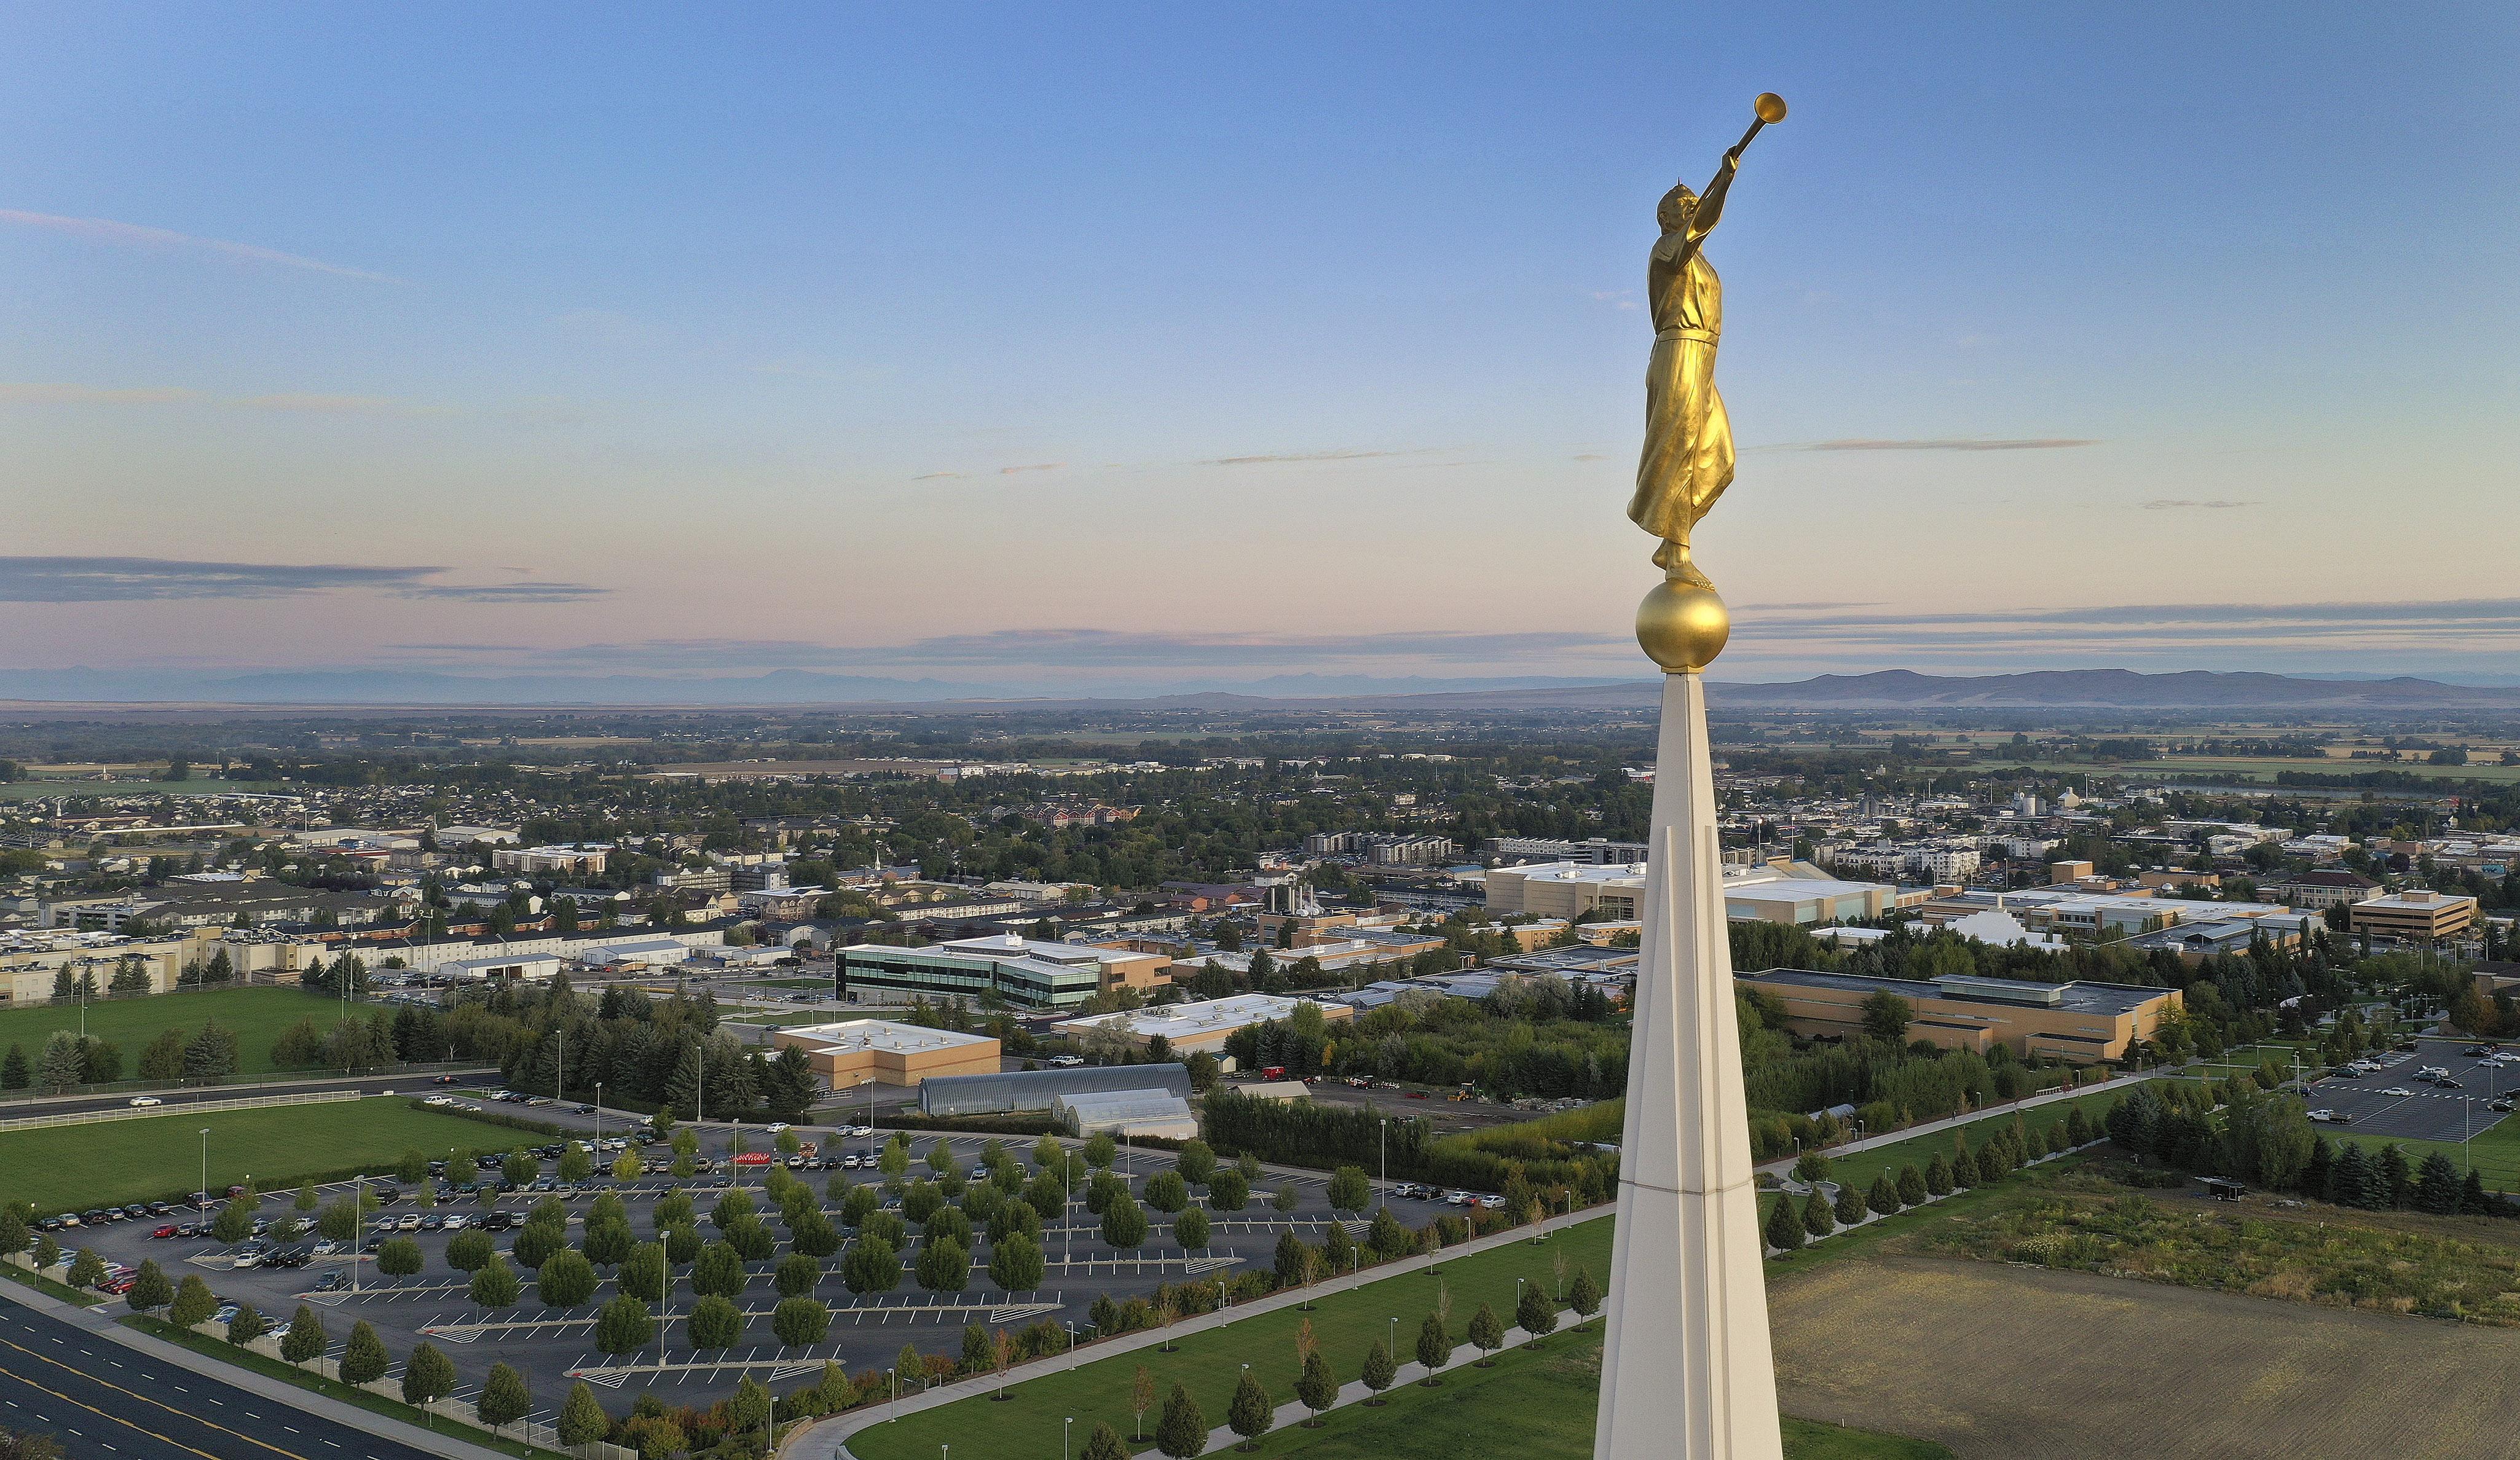 The BYU Idaho campus and the Rexburg Idaho Temple in Rexburg on Monday, Sept. 23, 2019.